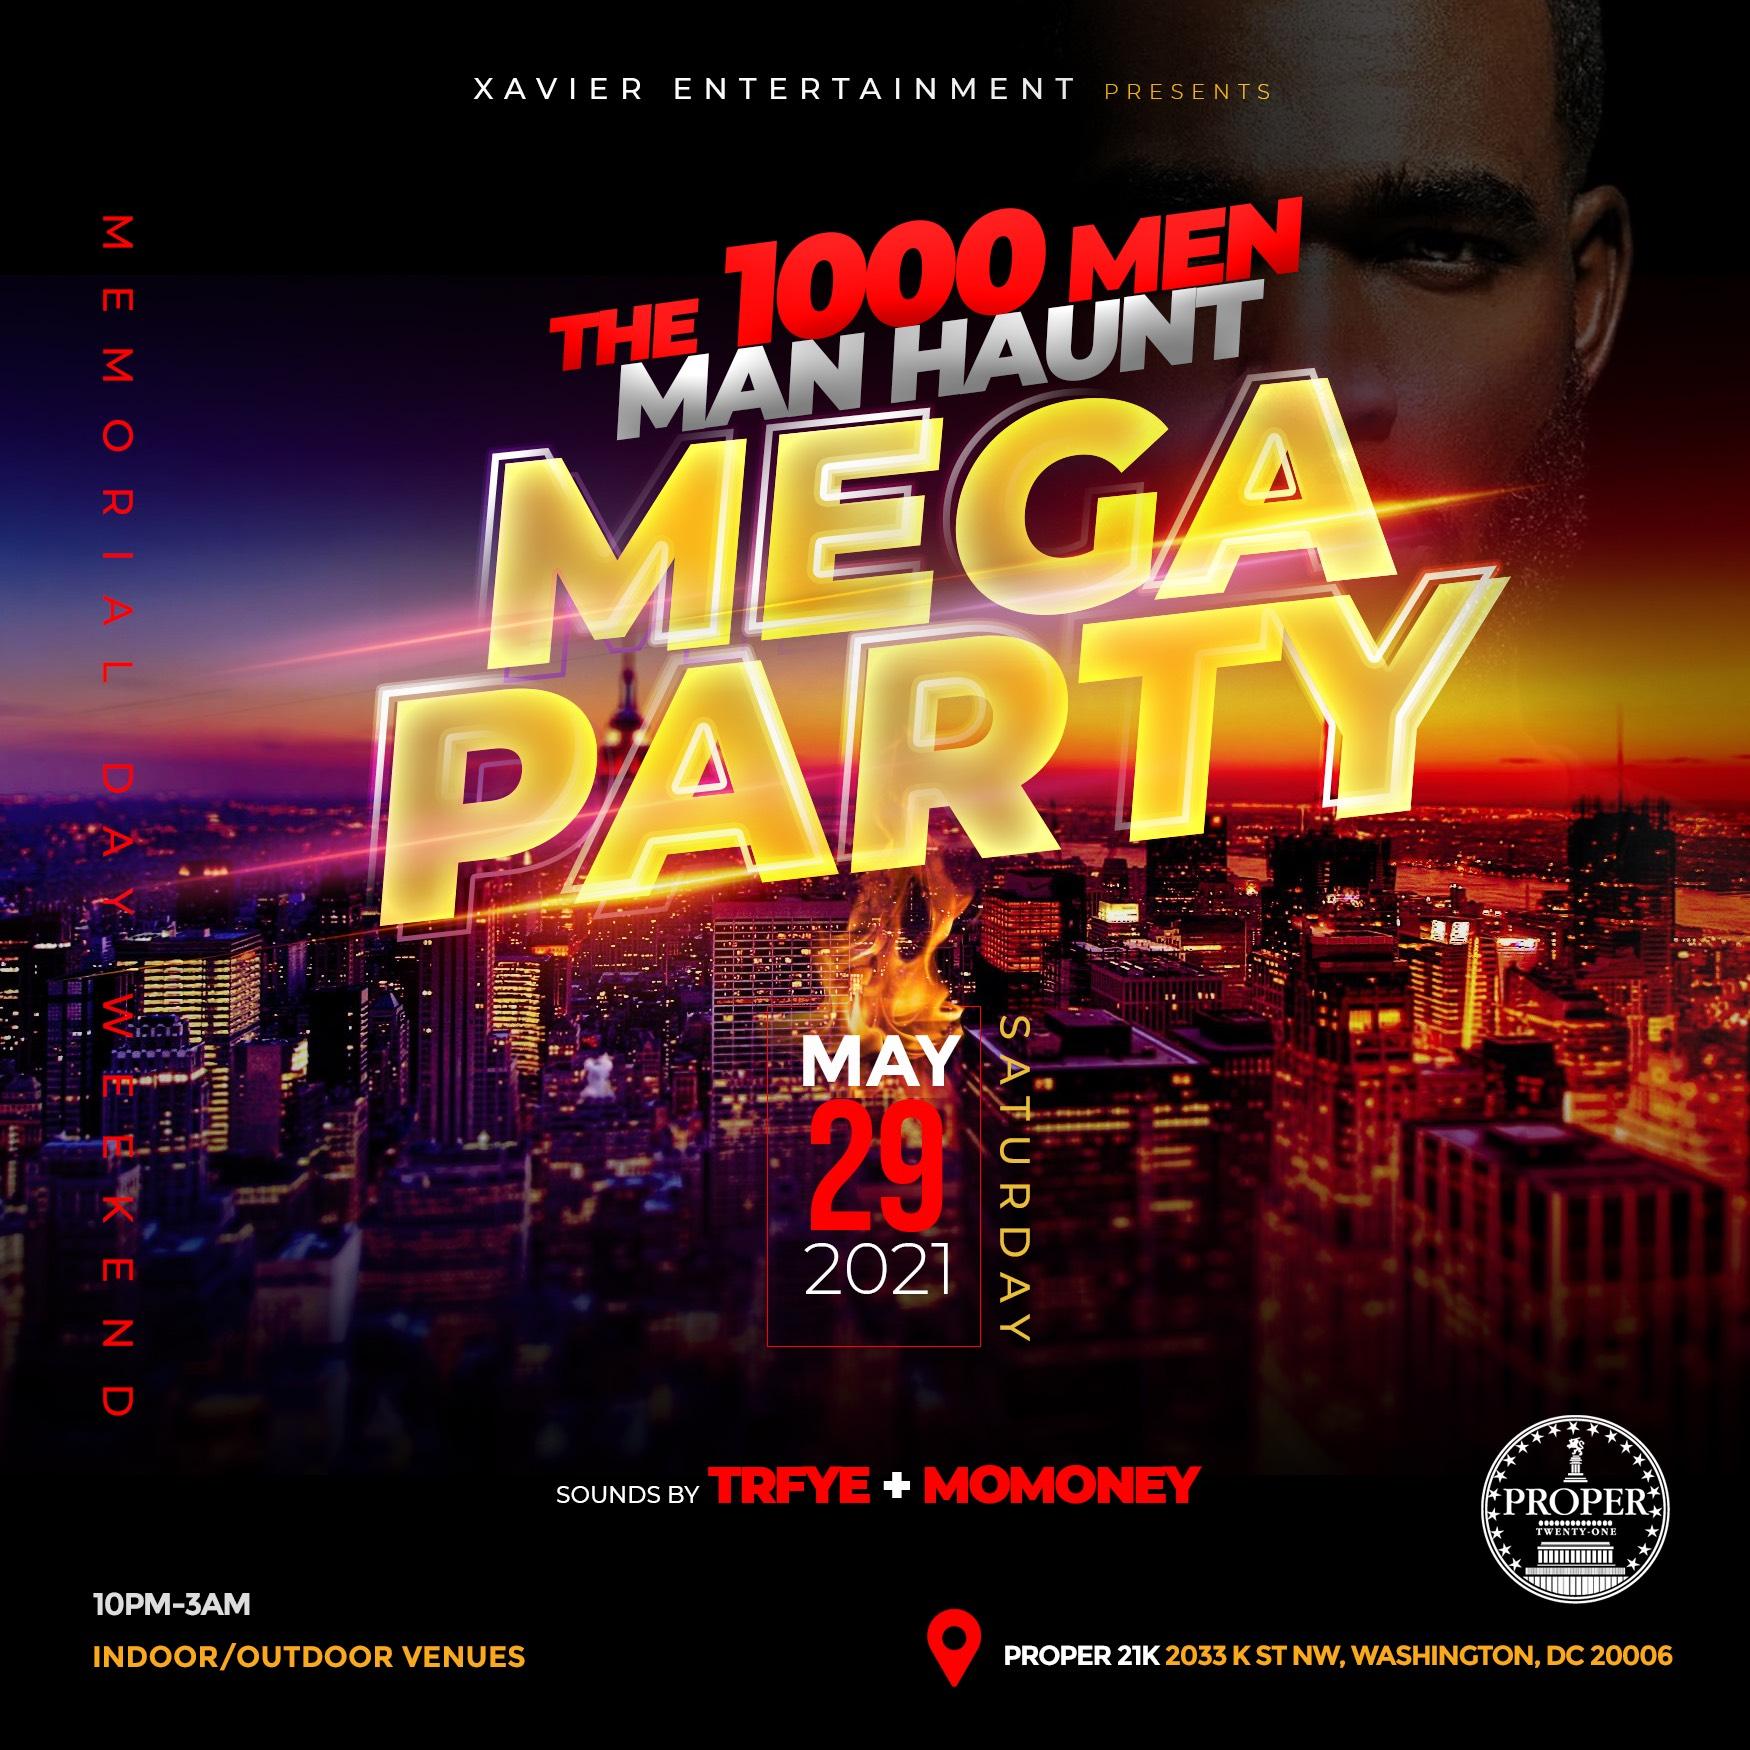 1,000 Men Manhunt Mega Party